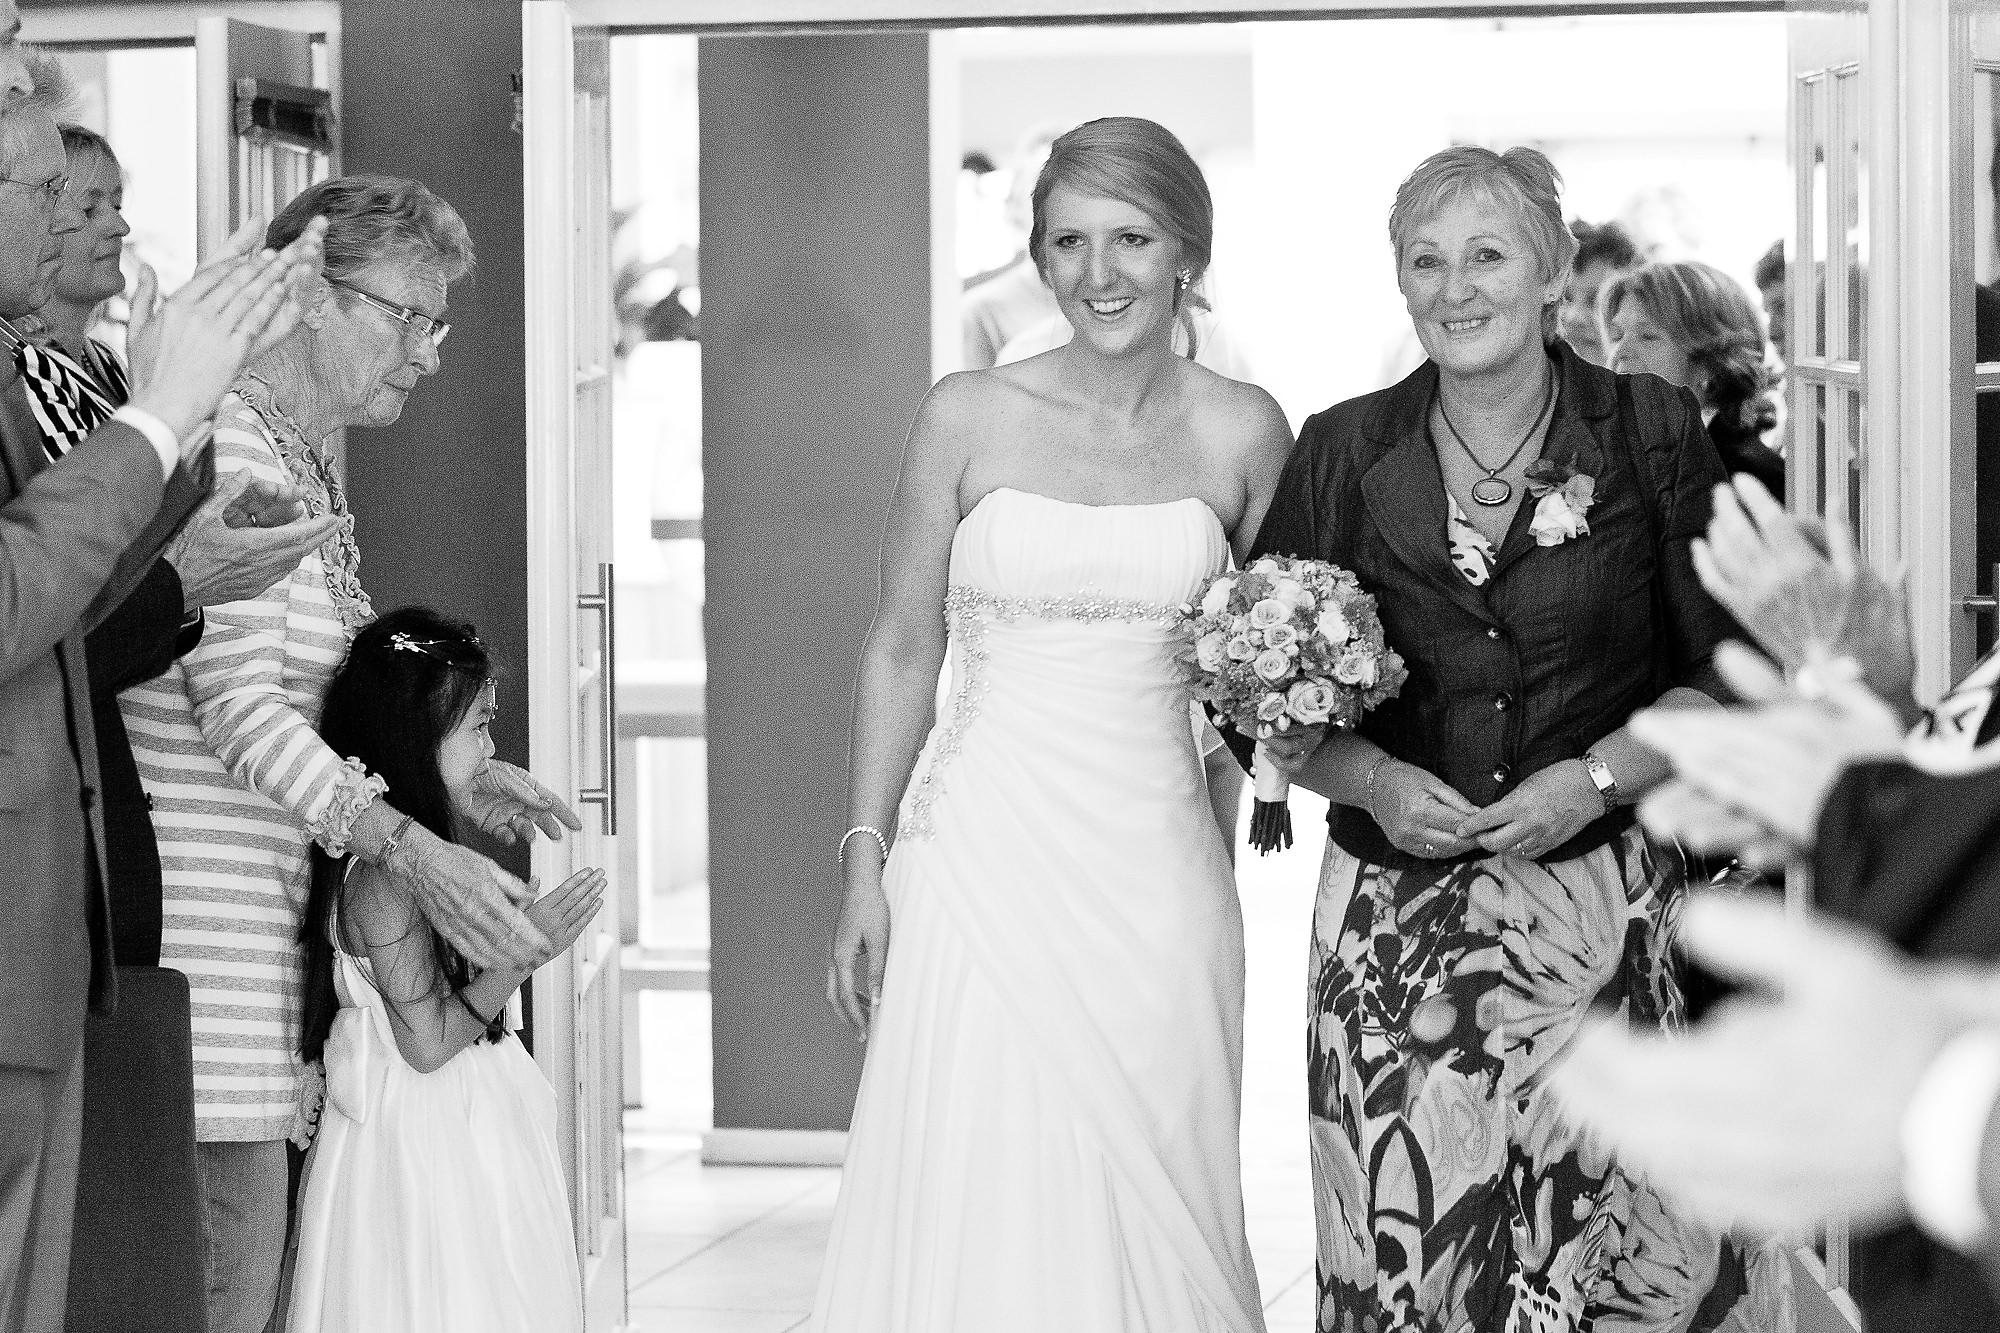 trouwshoot-bruidsfotografie-trouwfoto-feestfotografie-trouwreportage-Jorike en Sebastiaan609.jpg